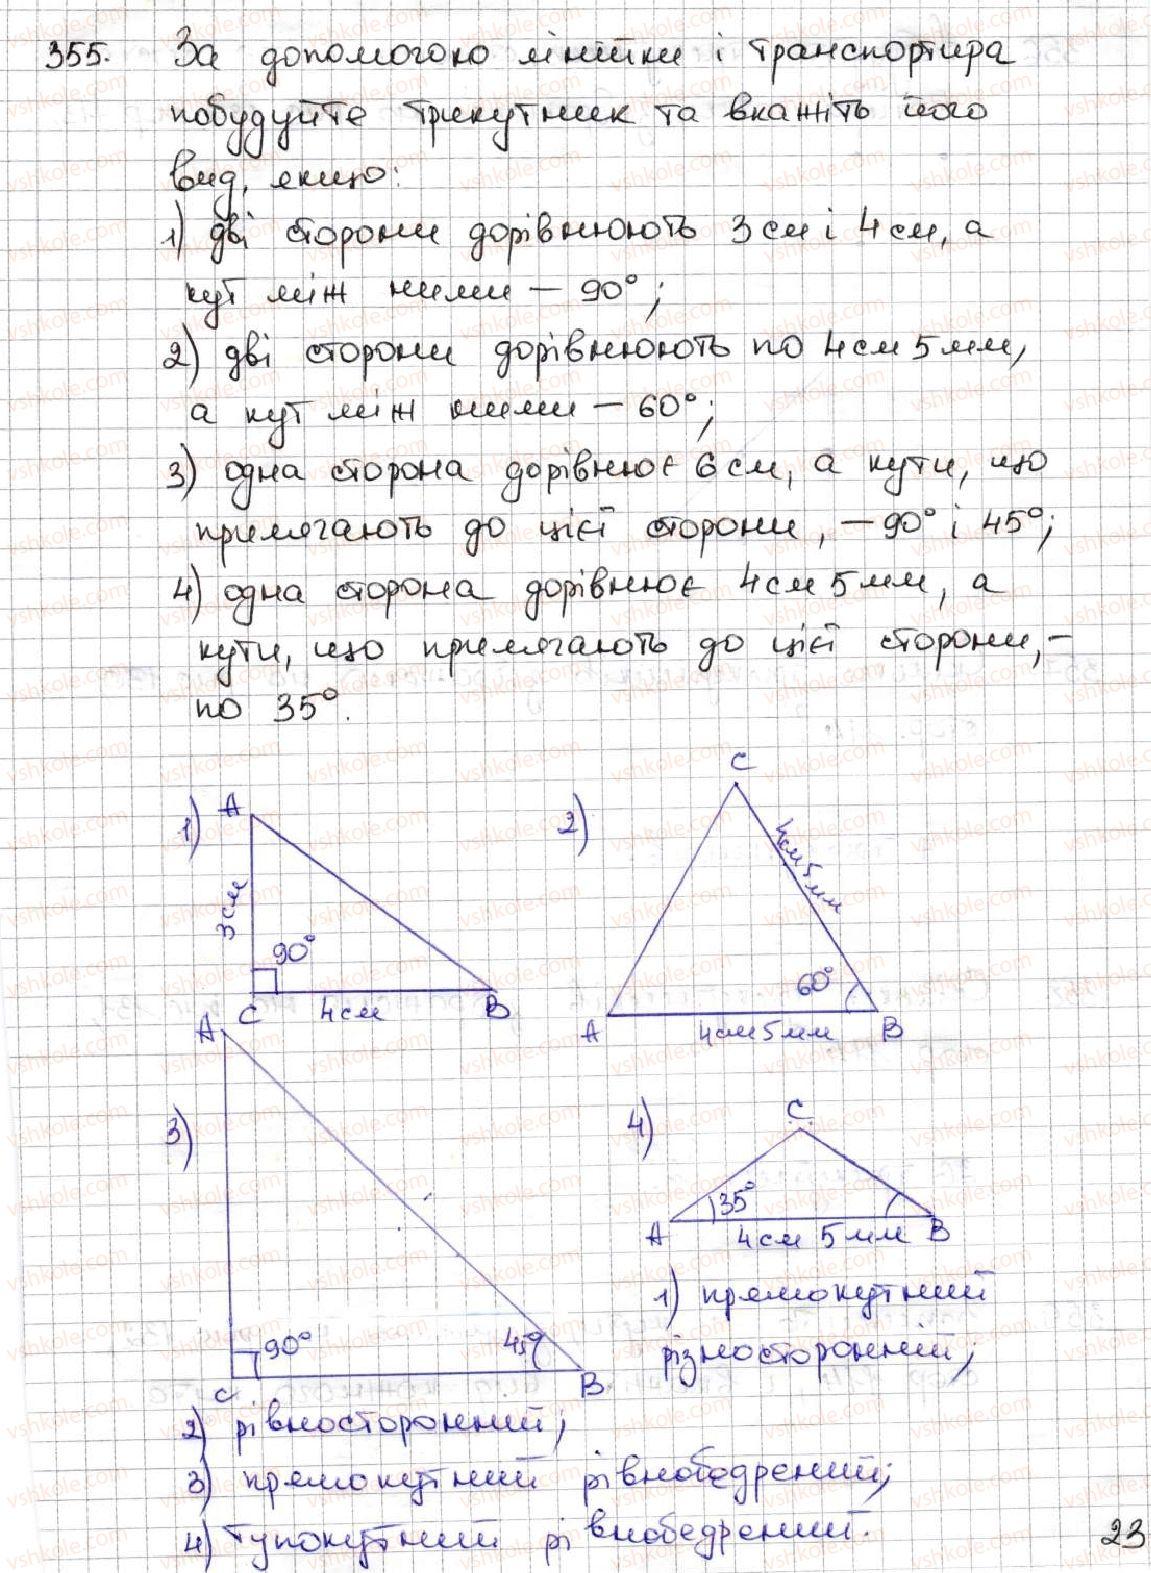 5-matematika-ag-merzlyak-vb-polonskij-ms-yakir-2013--2-dodavannya-i-vidnimannya-naturalnih-chisel-14-trikutnik-i-jogo-vidi-355.jpg